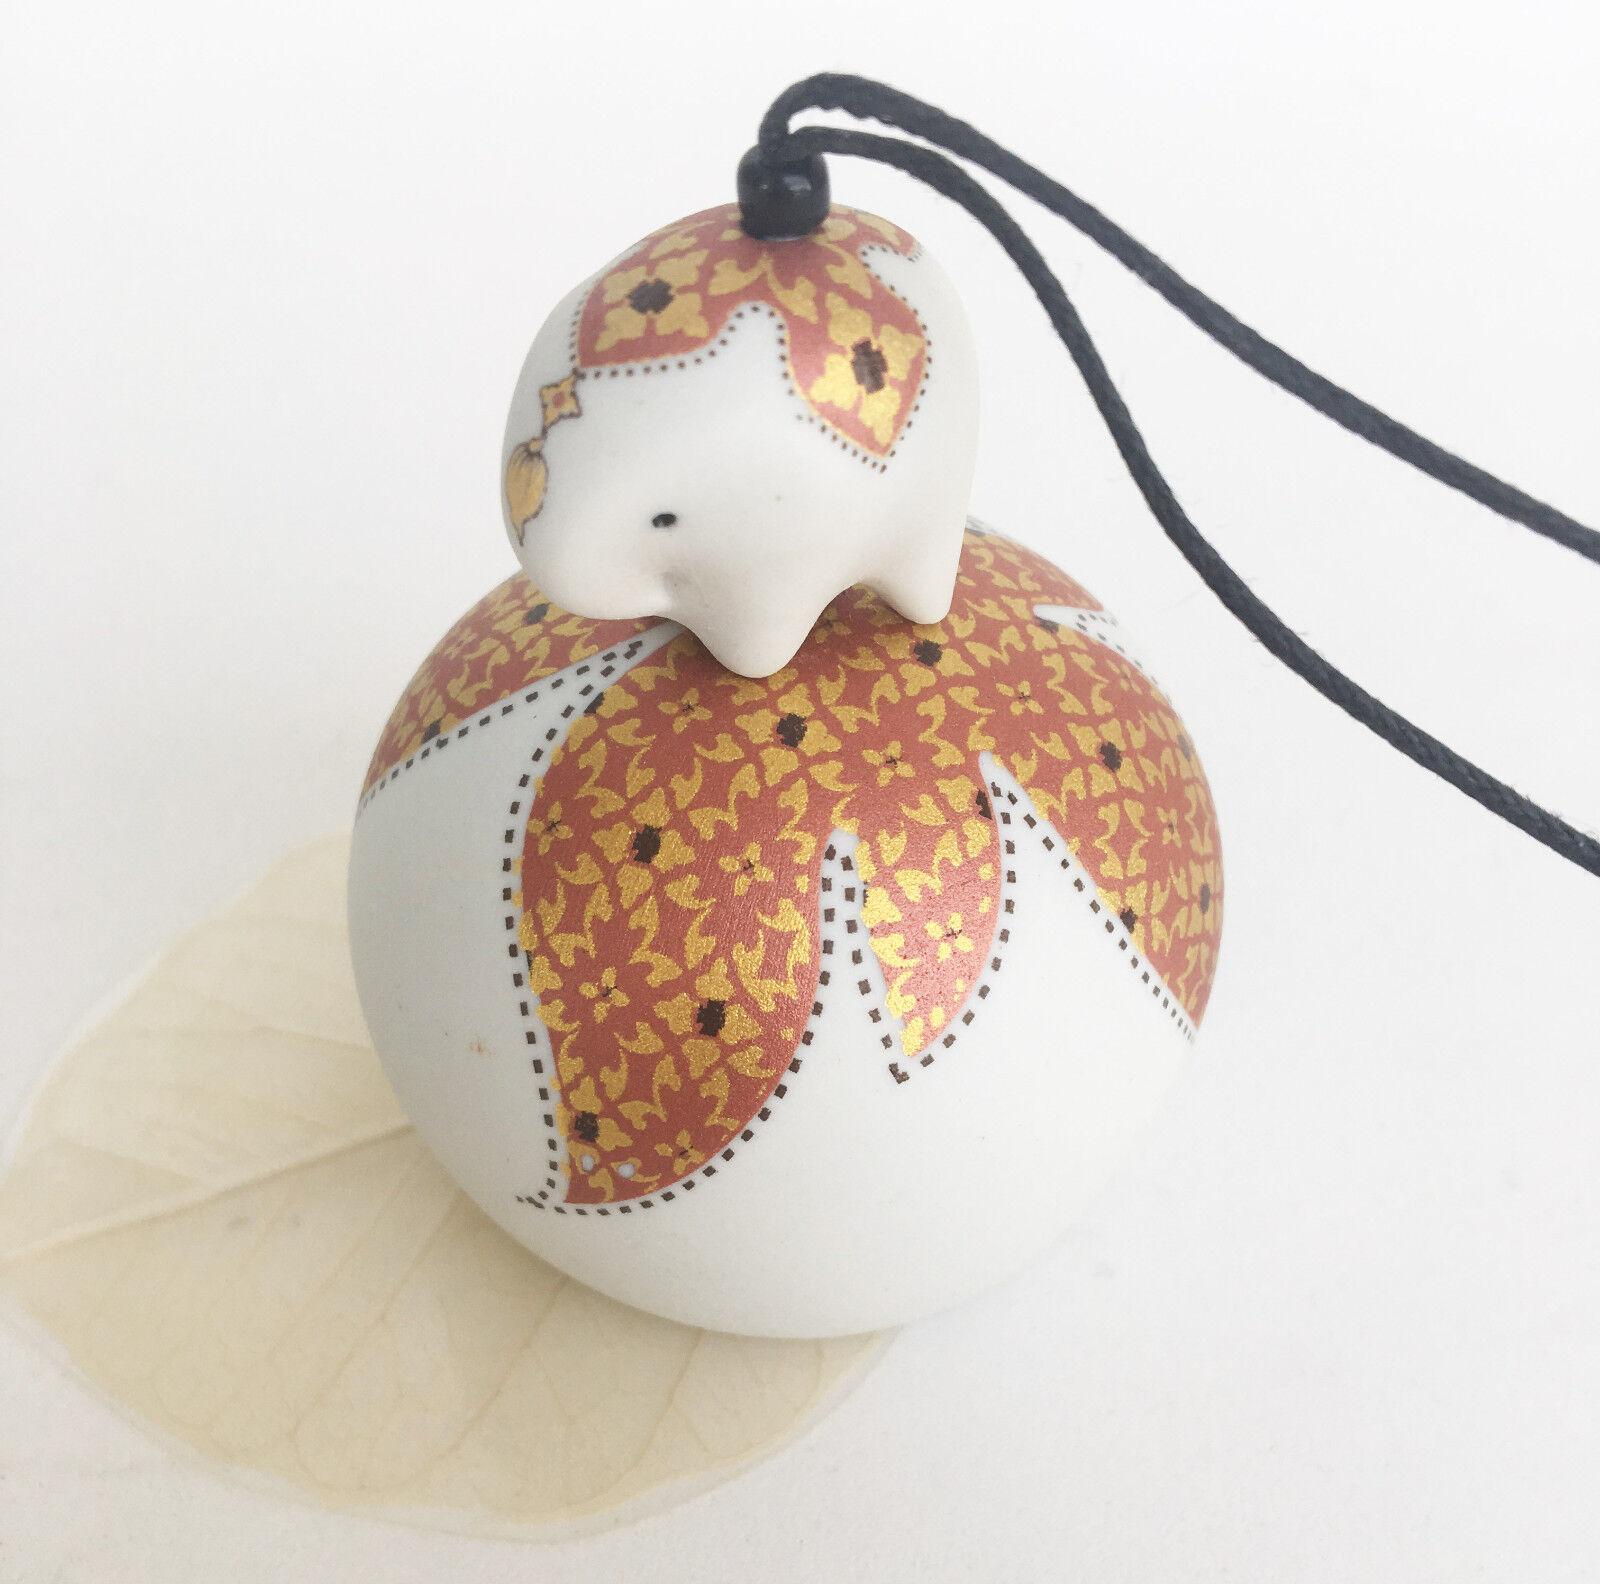 Elephant Wind Chime Bell Ceramic Orange Thai Art Painted Home Gift Decoration